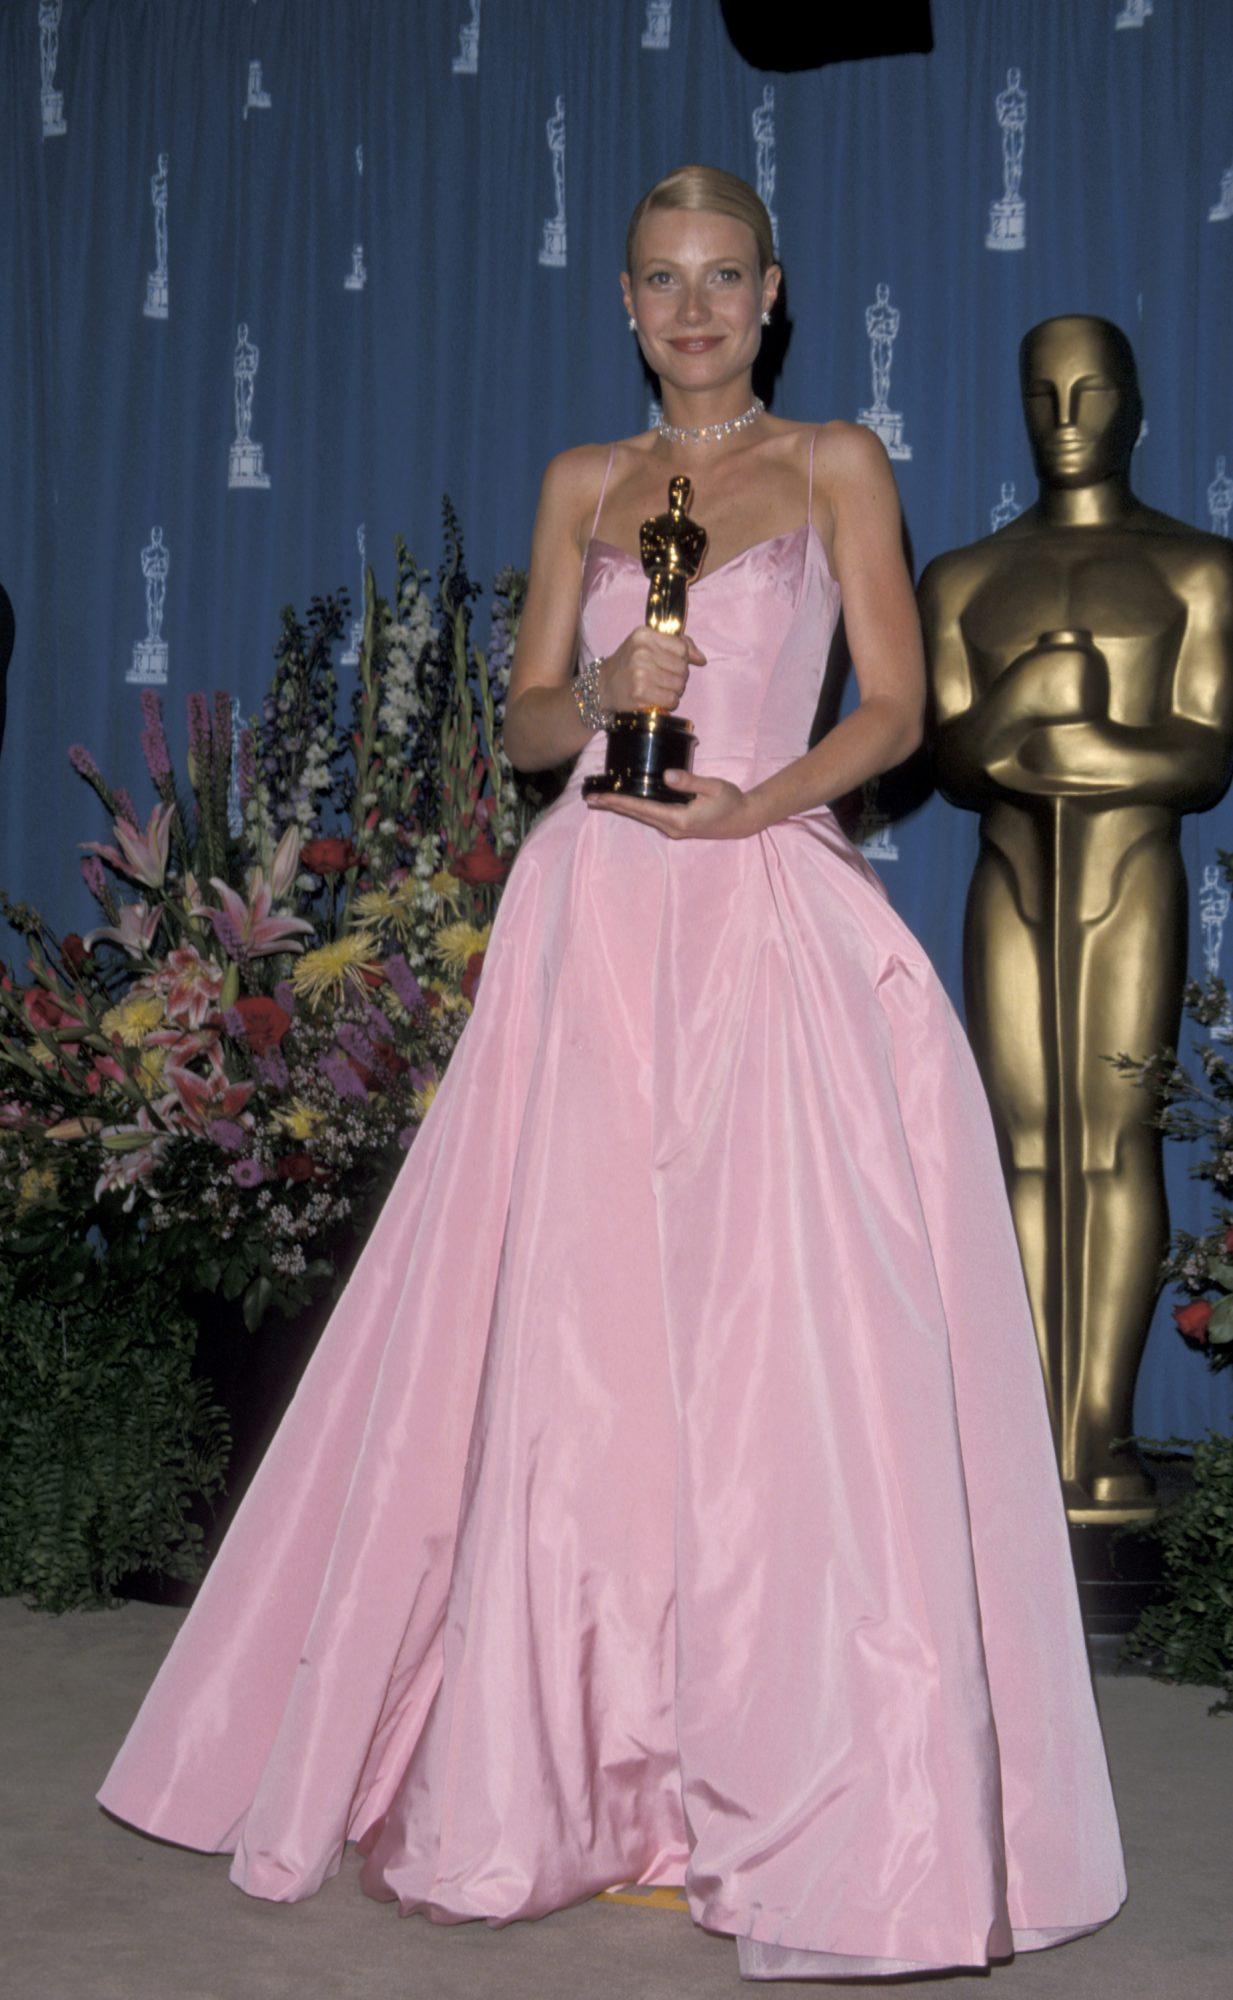 71st Annual Academy Awards - Press Room